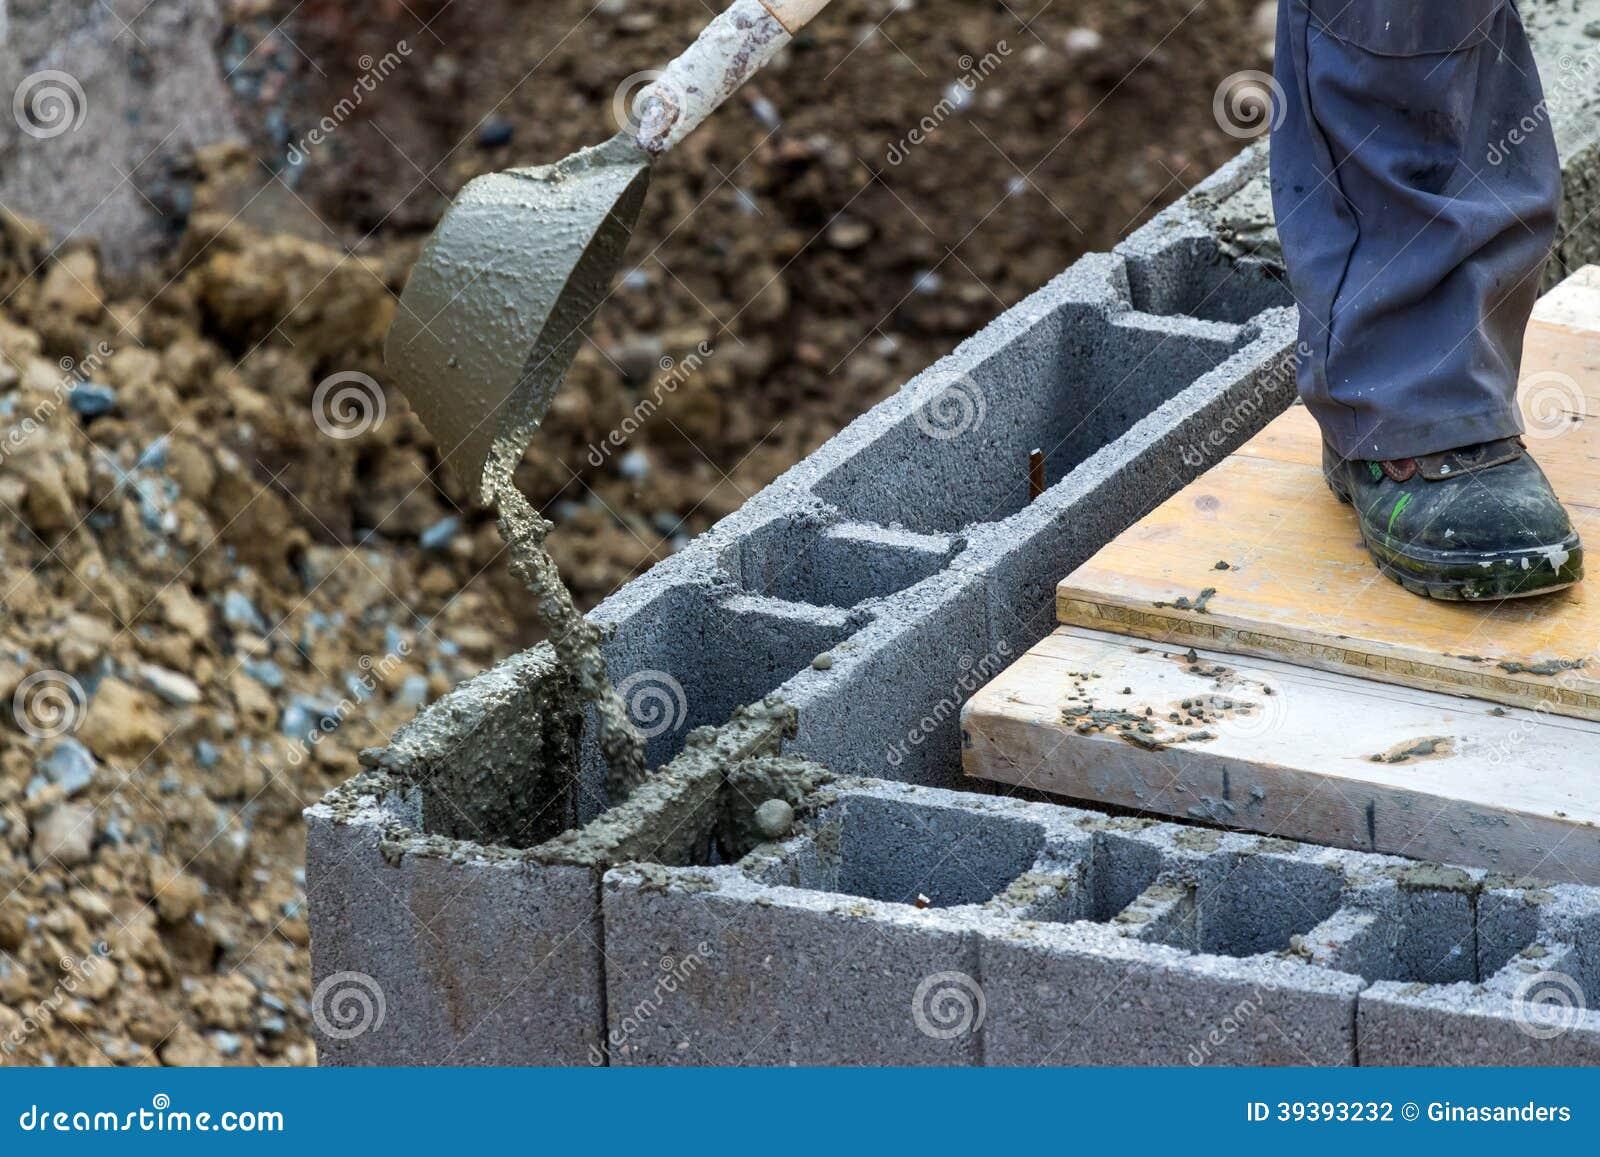 arbeiten mit beton stockfoto bild 39393232. Black Bedroom Furniture Sets. Home Design Ideas